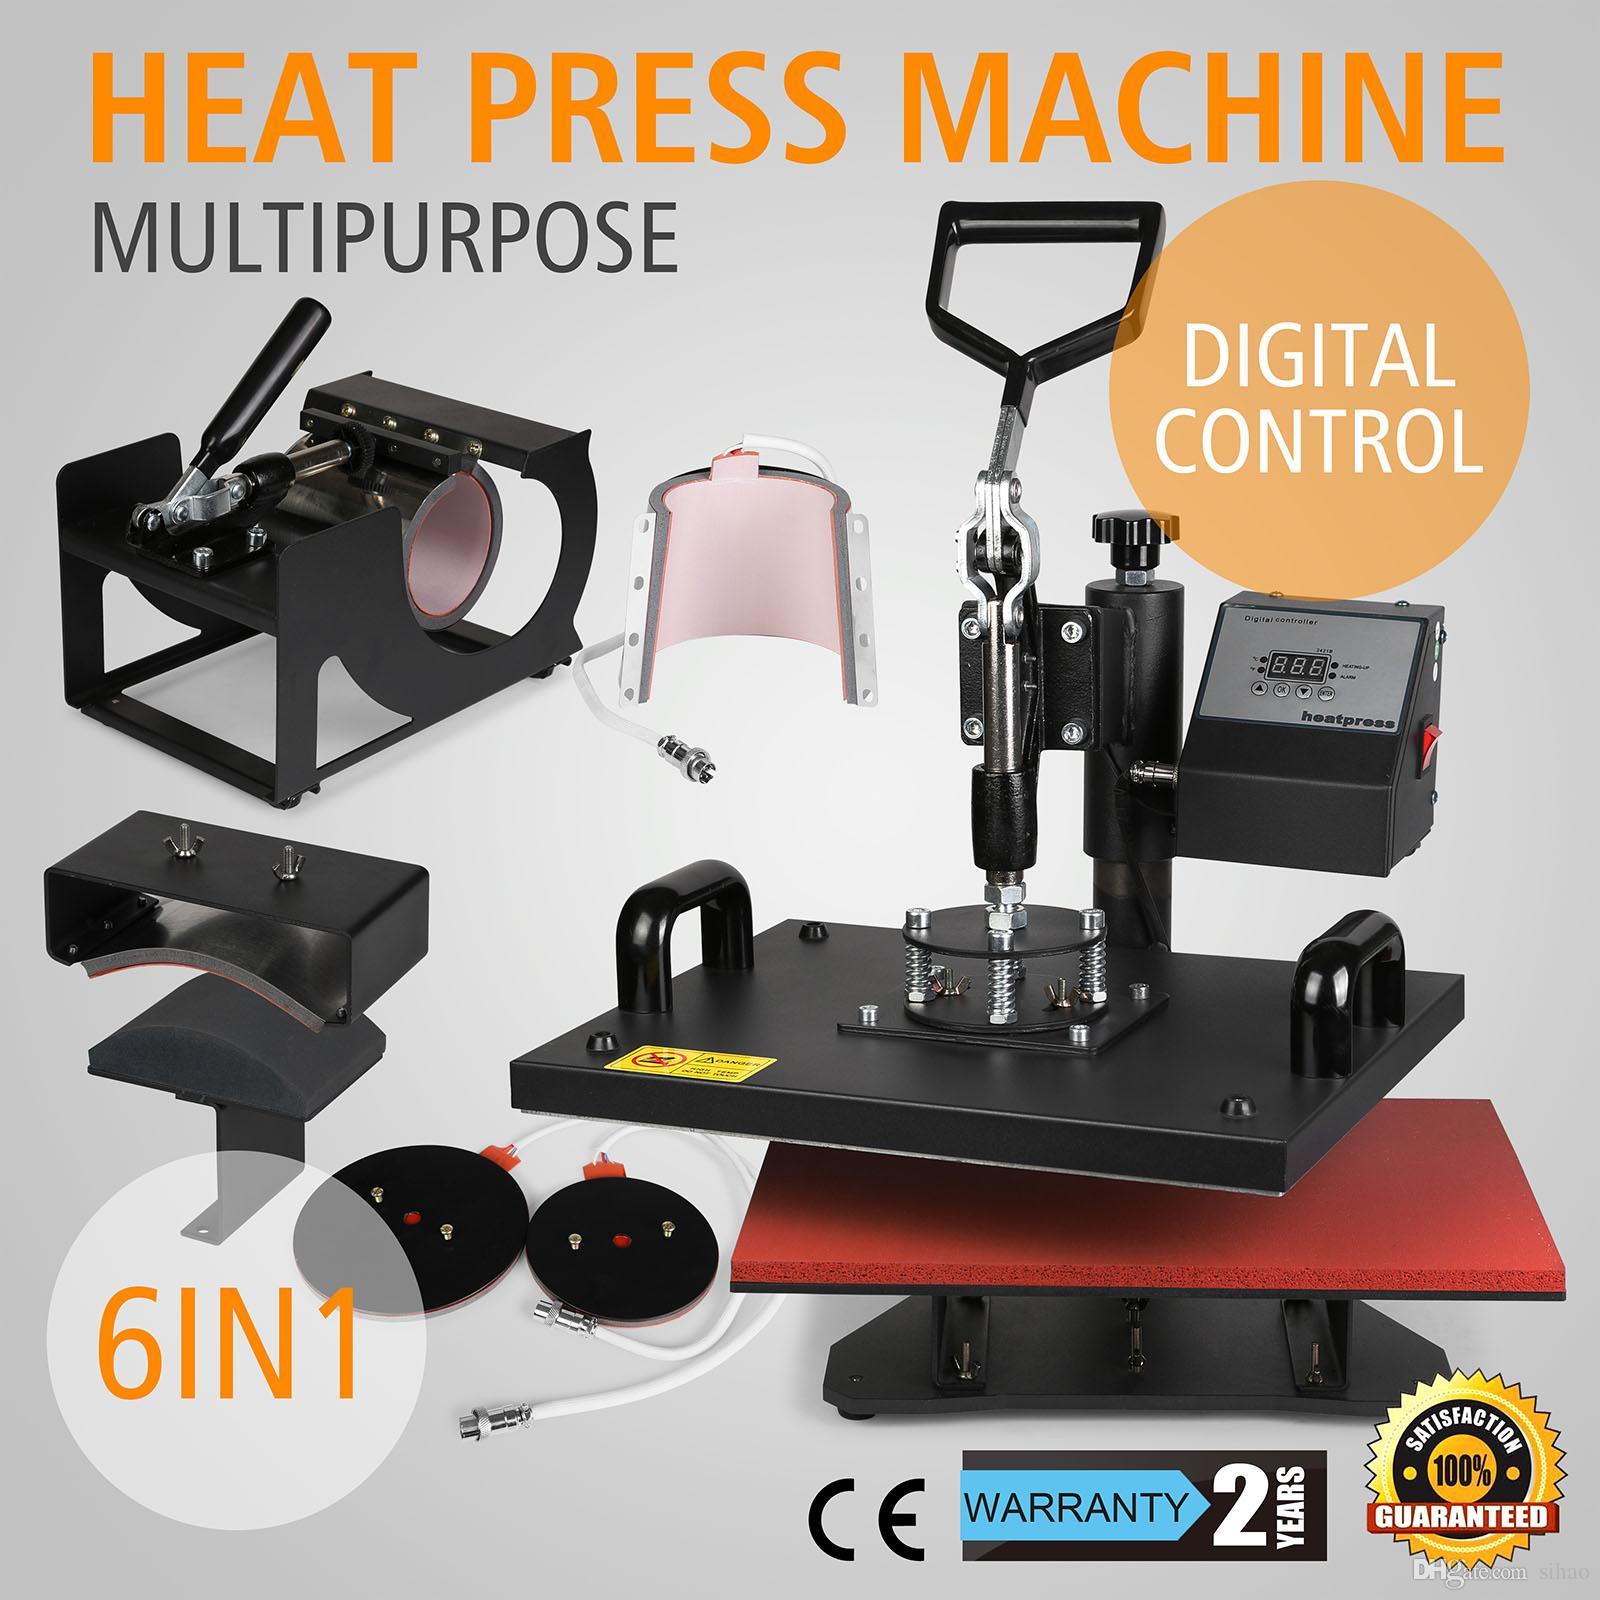 5 6 7 8 9 in 1 Digital Heat Press Machine Multifunctional T-Shirt Mug Cup  Hat Cap Transfer Sublimation